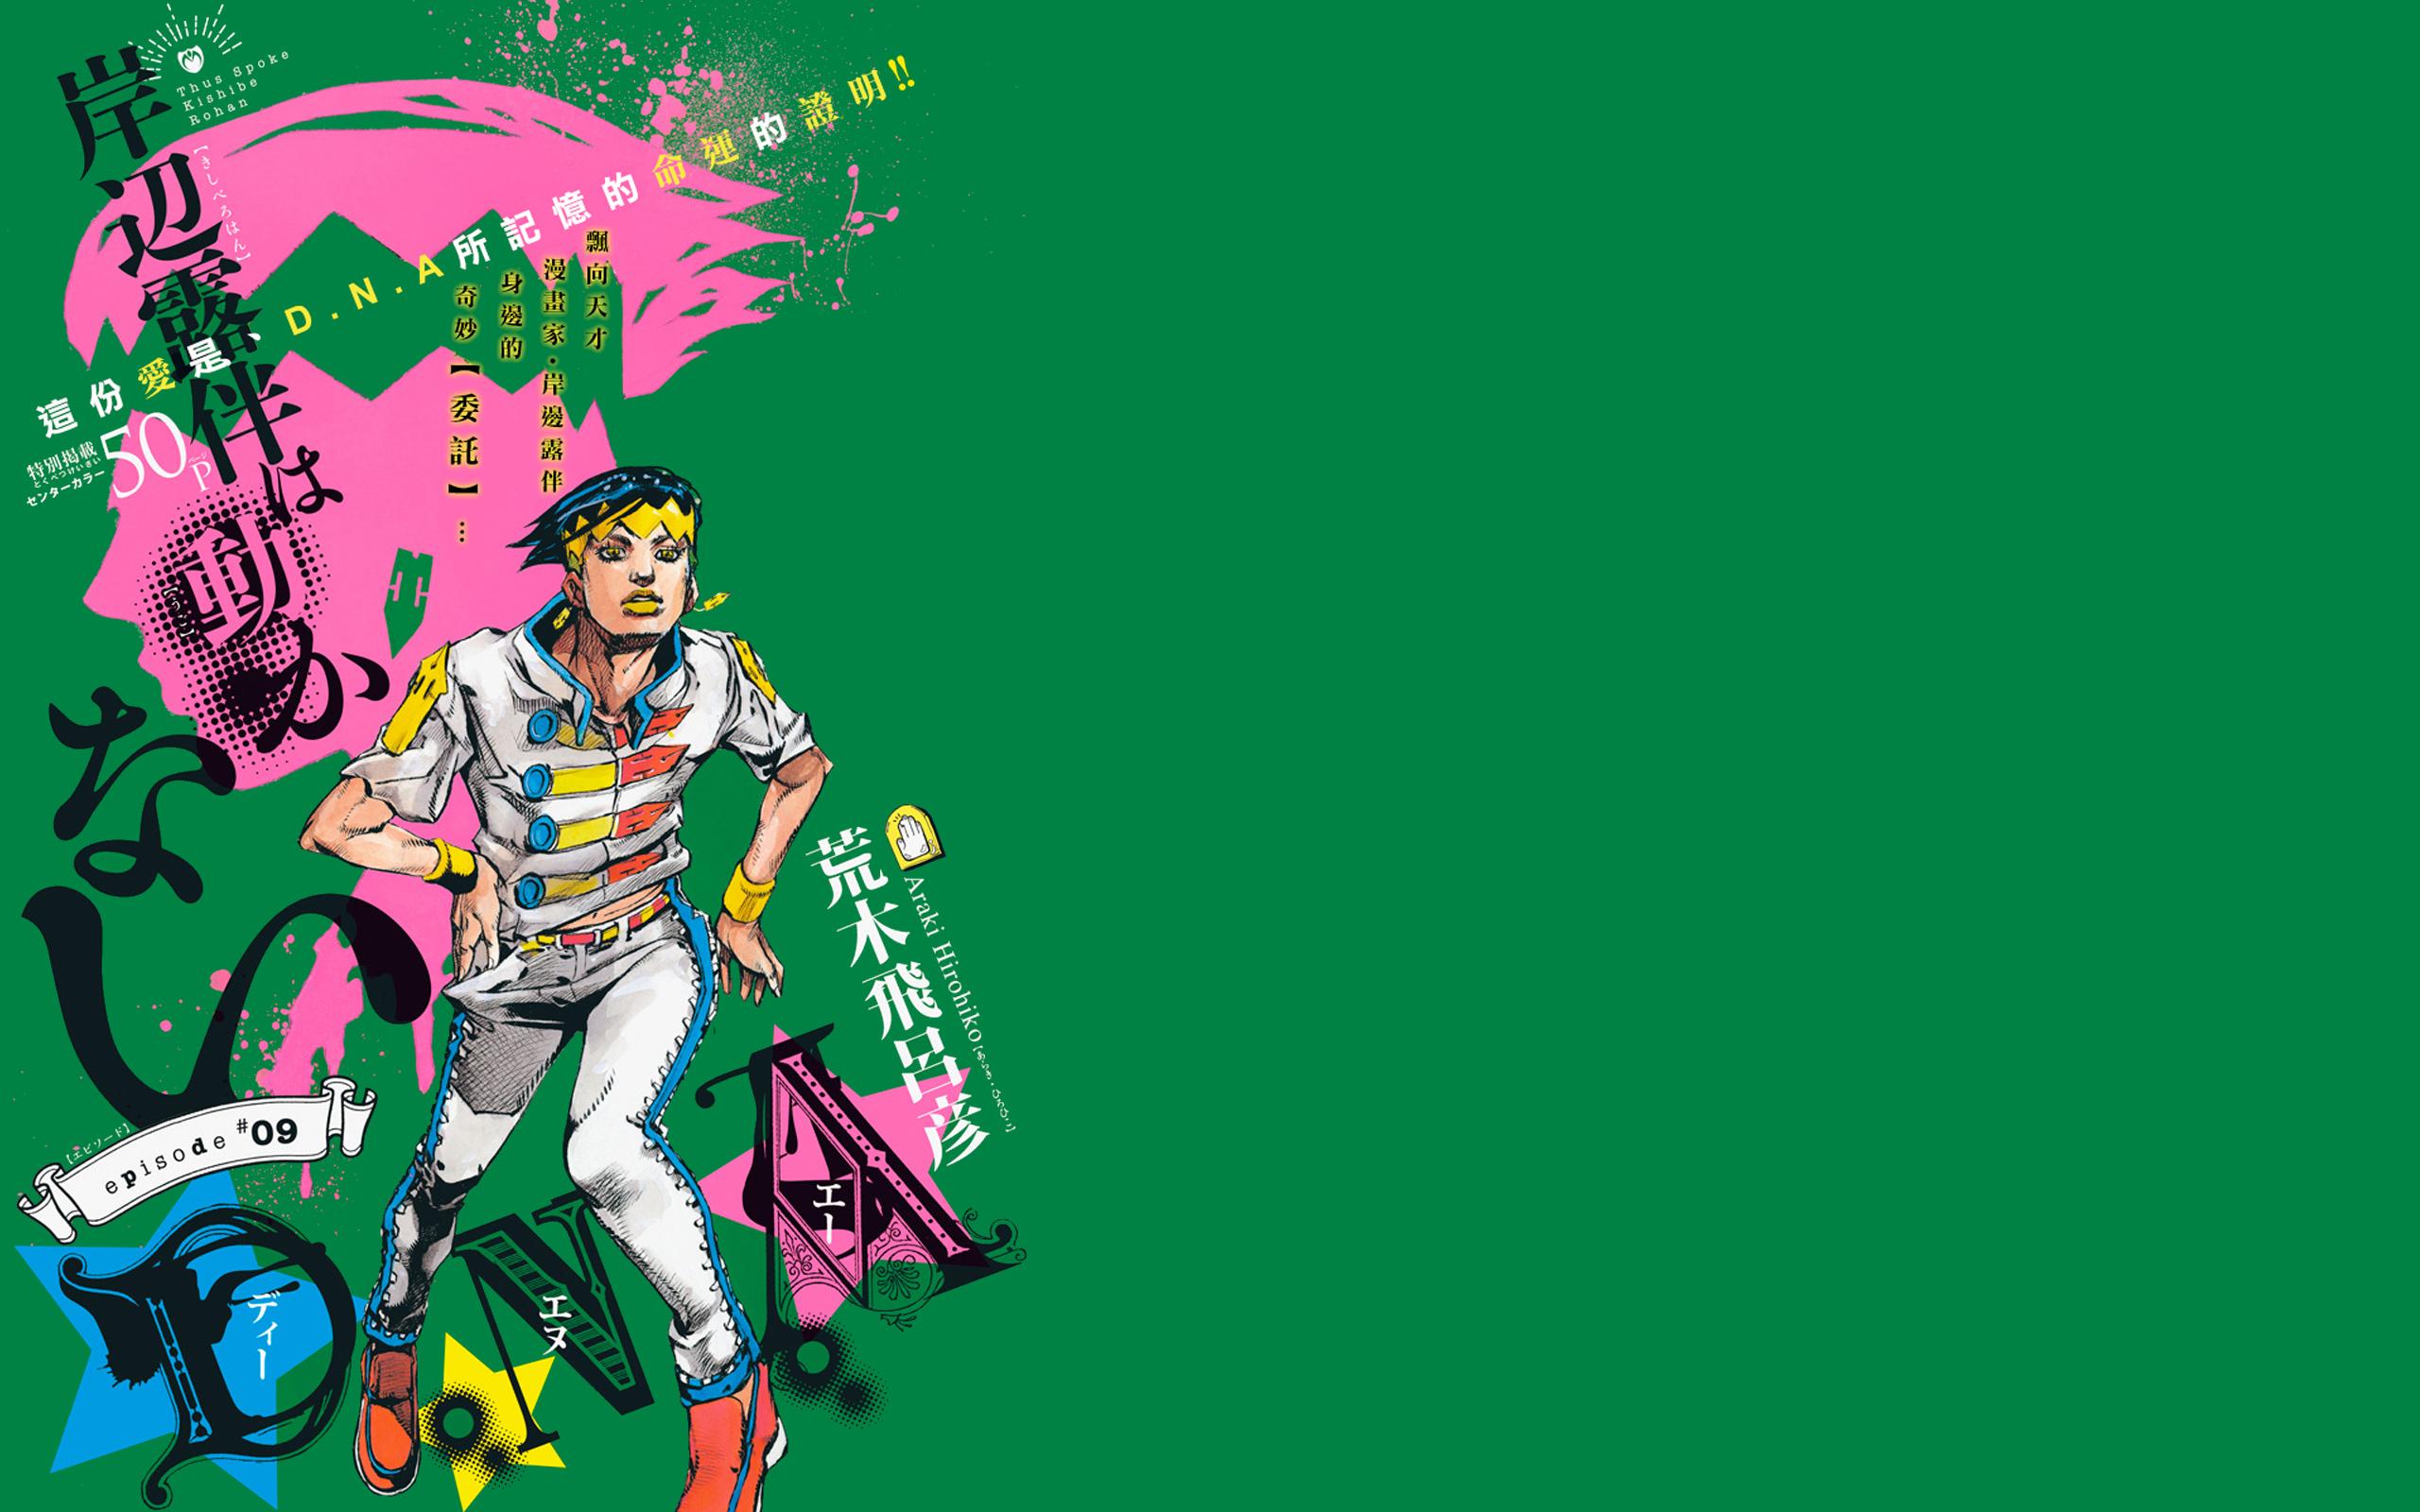 Wallpaper Jojo S Bizarre Adventure Jojo Anime Manga Hirohiko Araki Josuke Higashikata Jojolion 2560x1600 Triton 1595795 Hd Wallpapers Wallhere